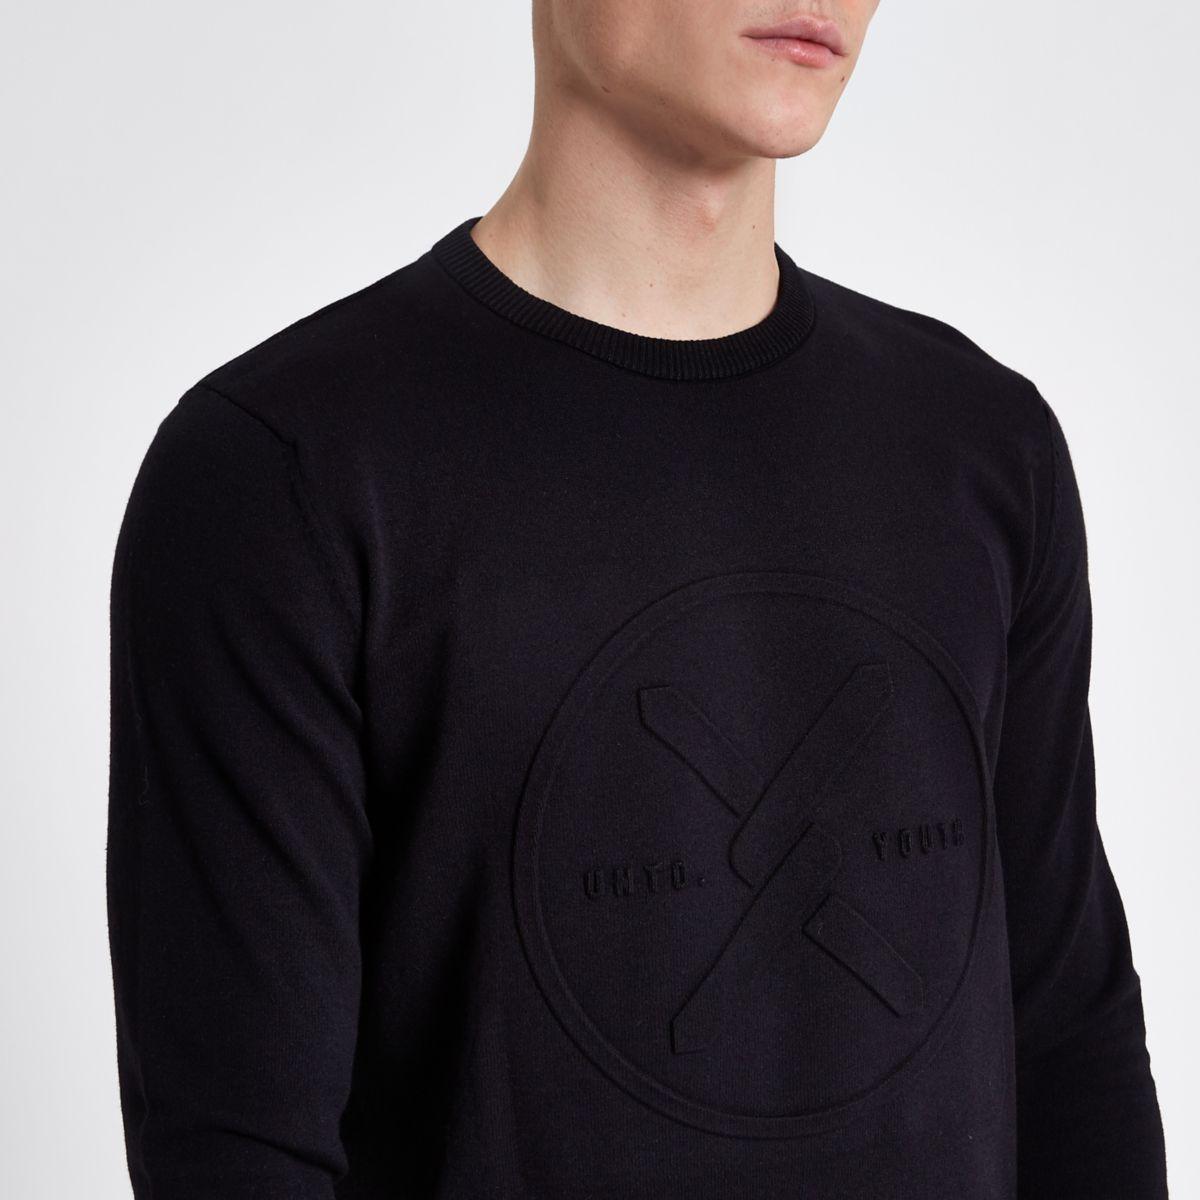 Jack & Jones Core black knit jumper